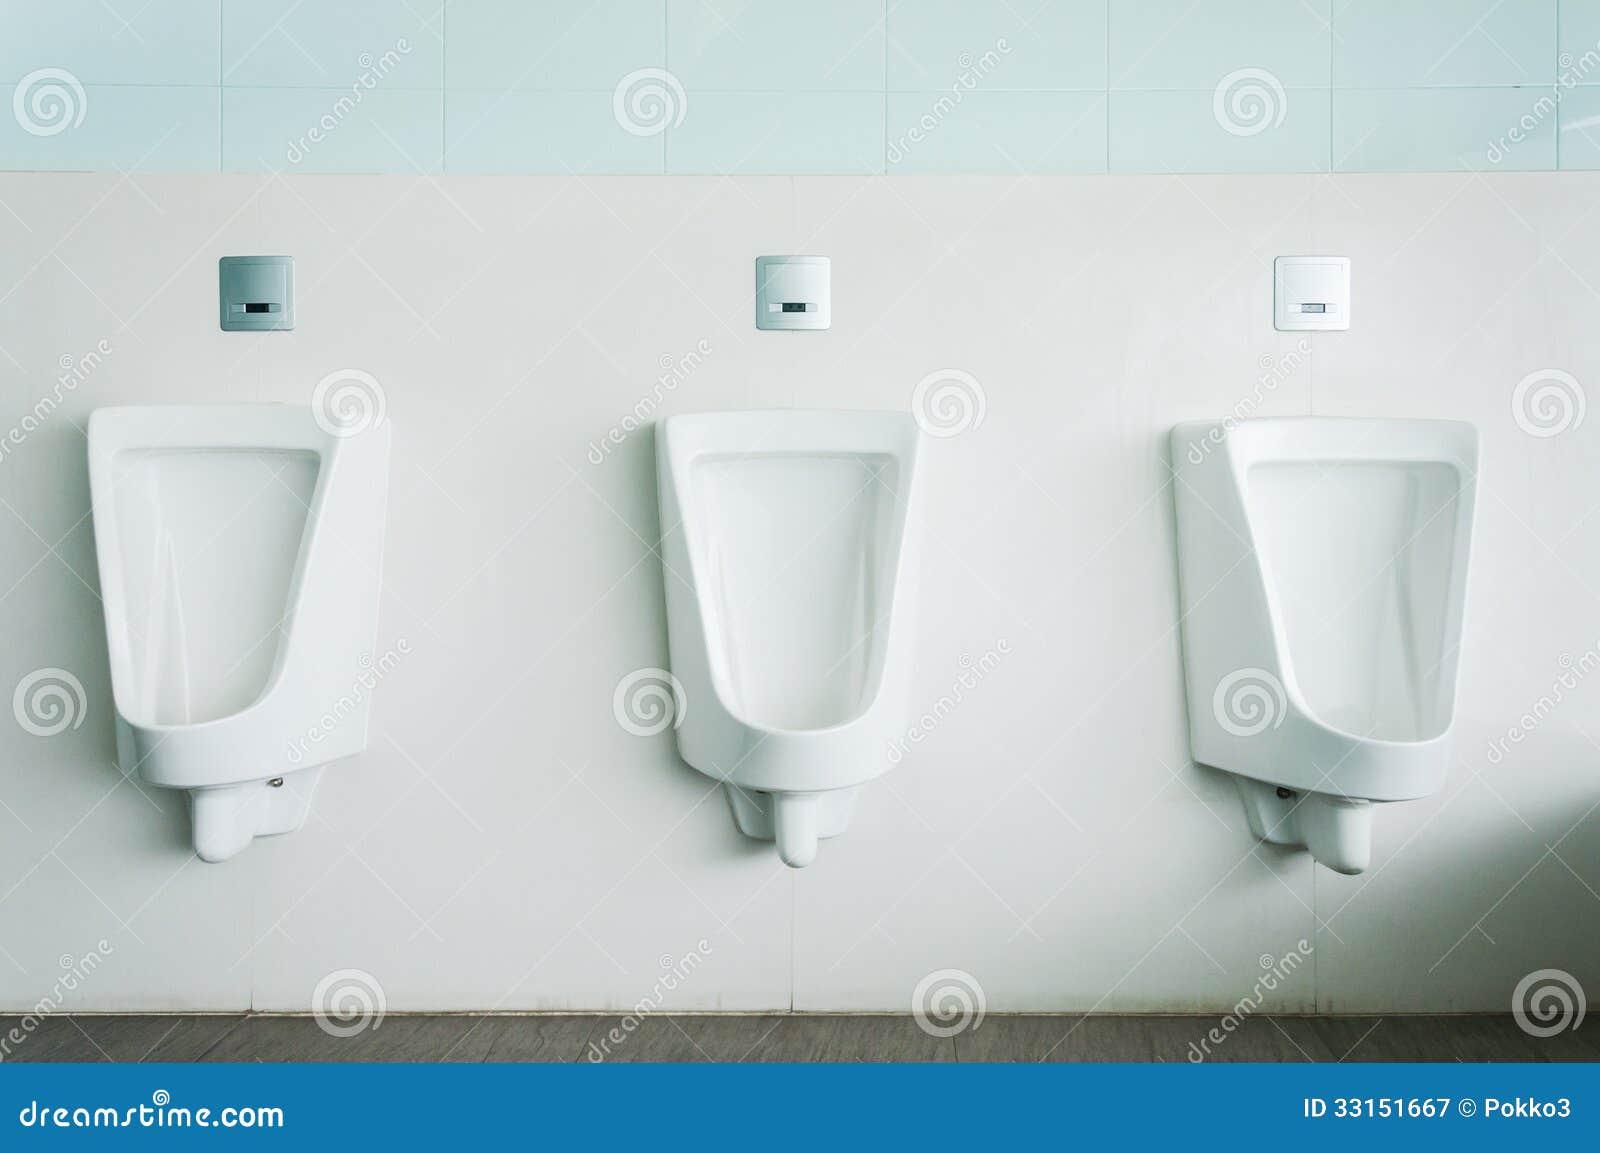 White porcelain urinals stock image. Image of porcelain -